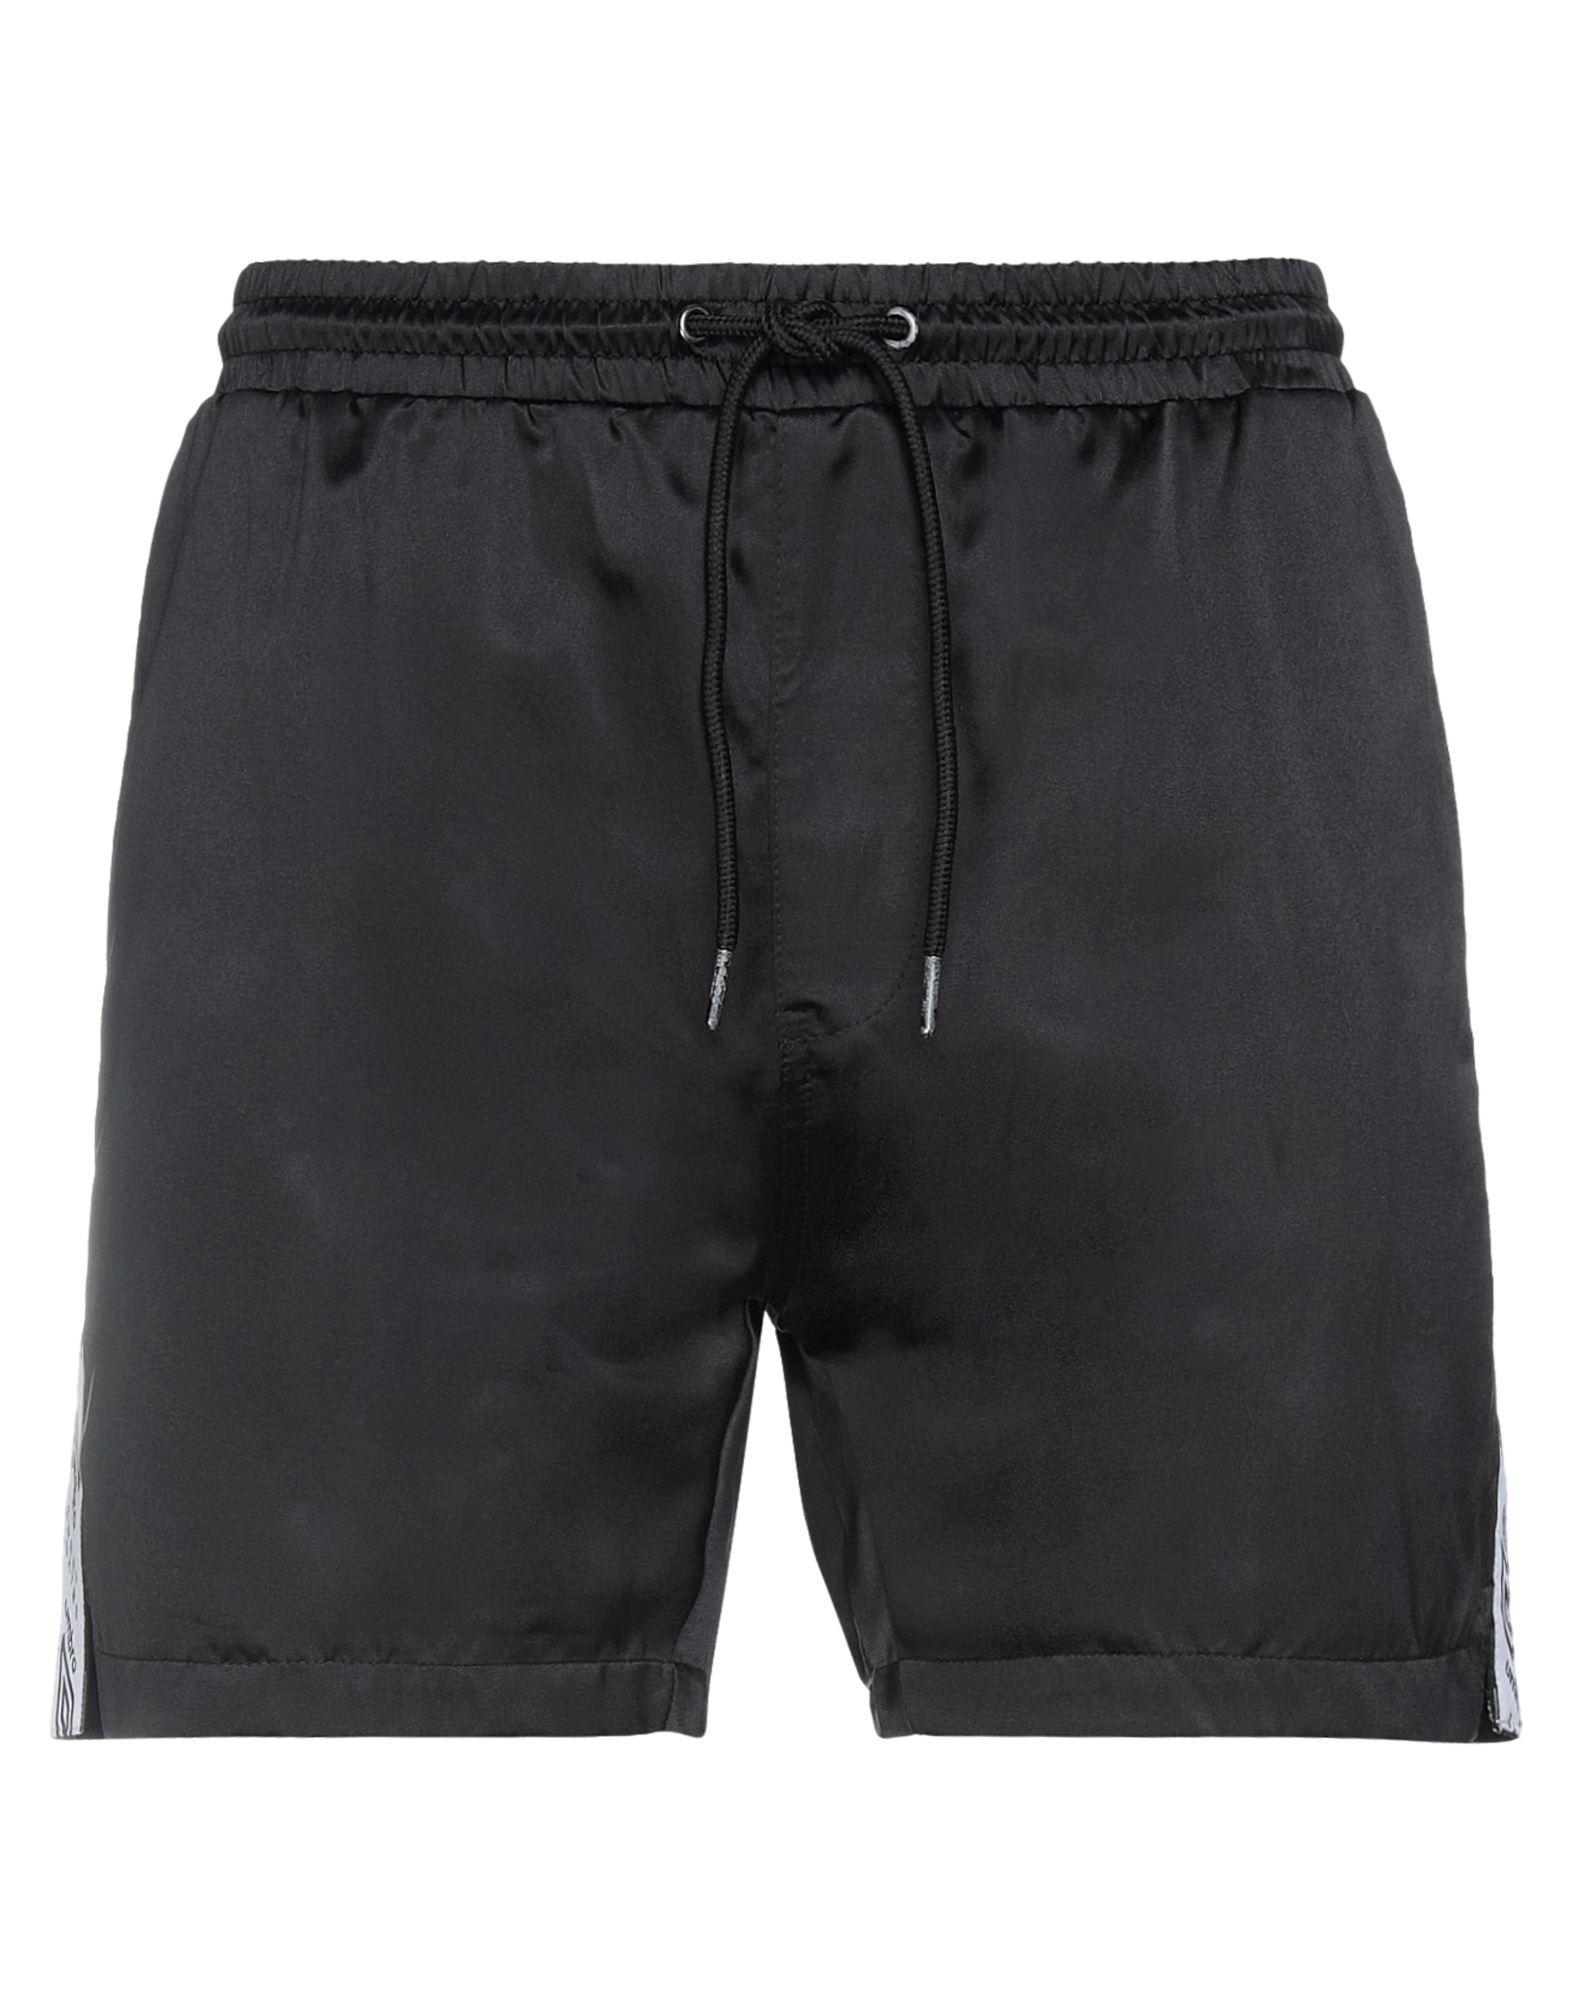 SWEET SKTBS x UMBRO Шорты и бермуды sweet sktbs джинсовые шорты